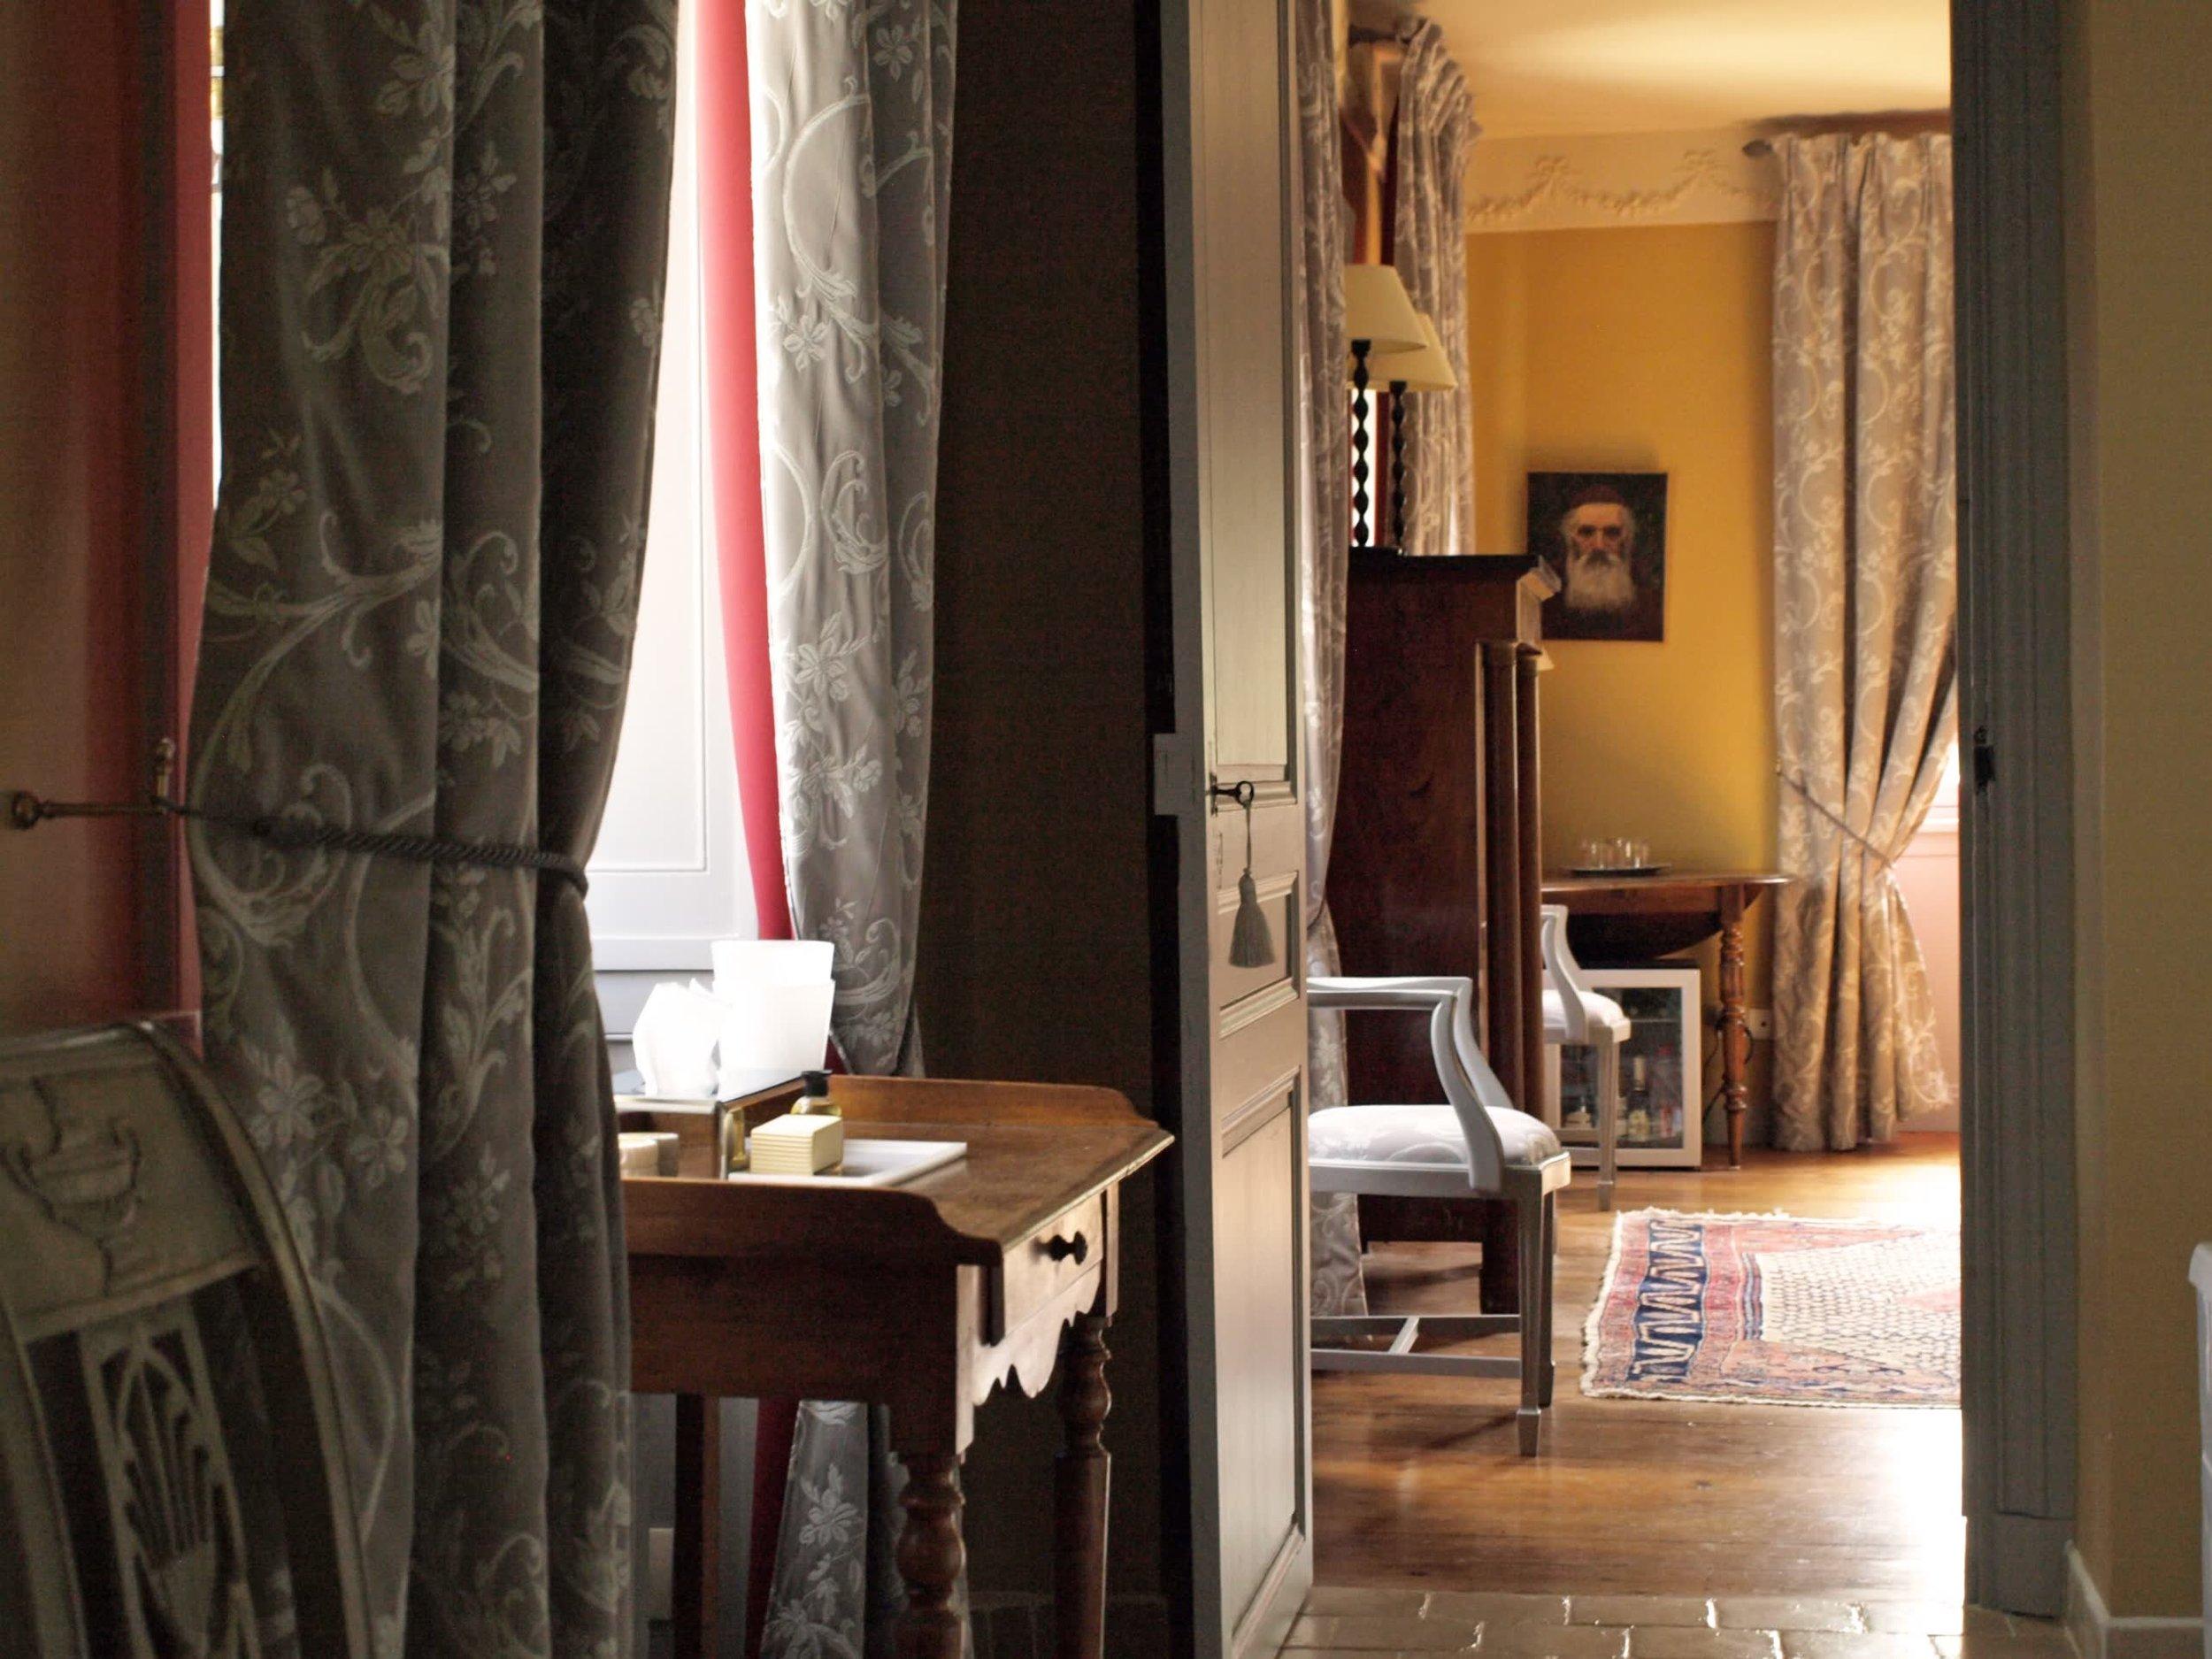 Chateau de la Pommeraye - charming boutique hotel chateau b&b spa normandy calvados bedroom Levants 3(2).jpg